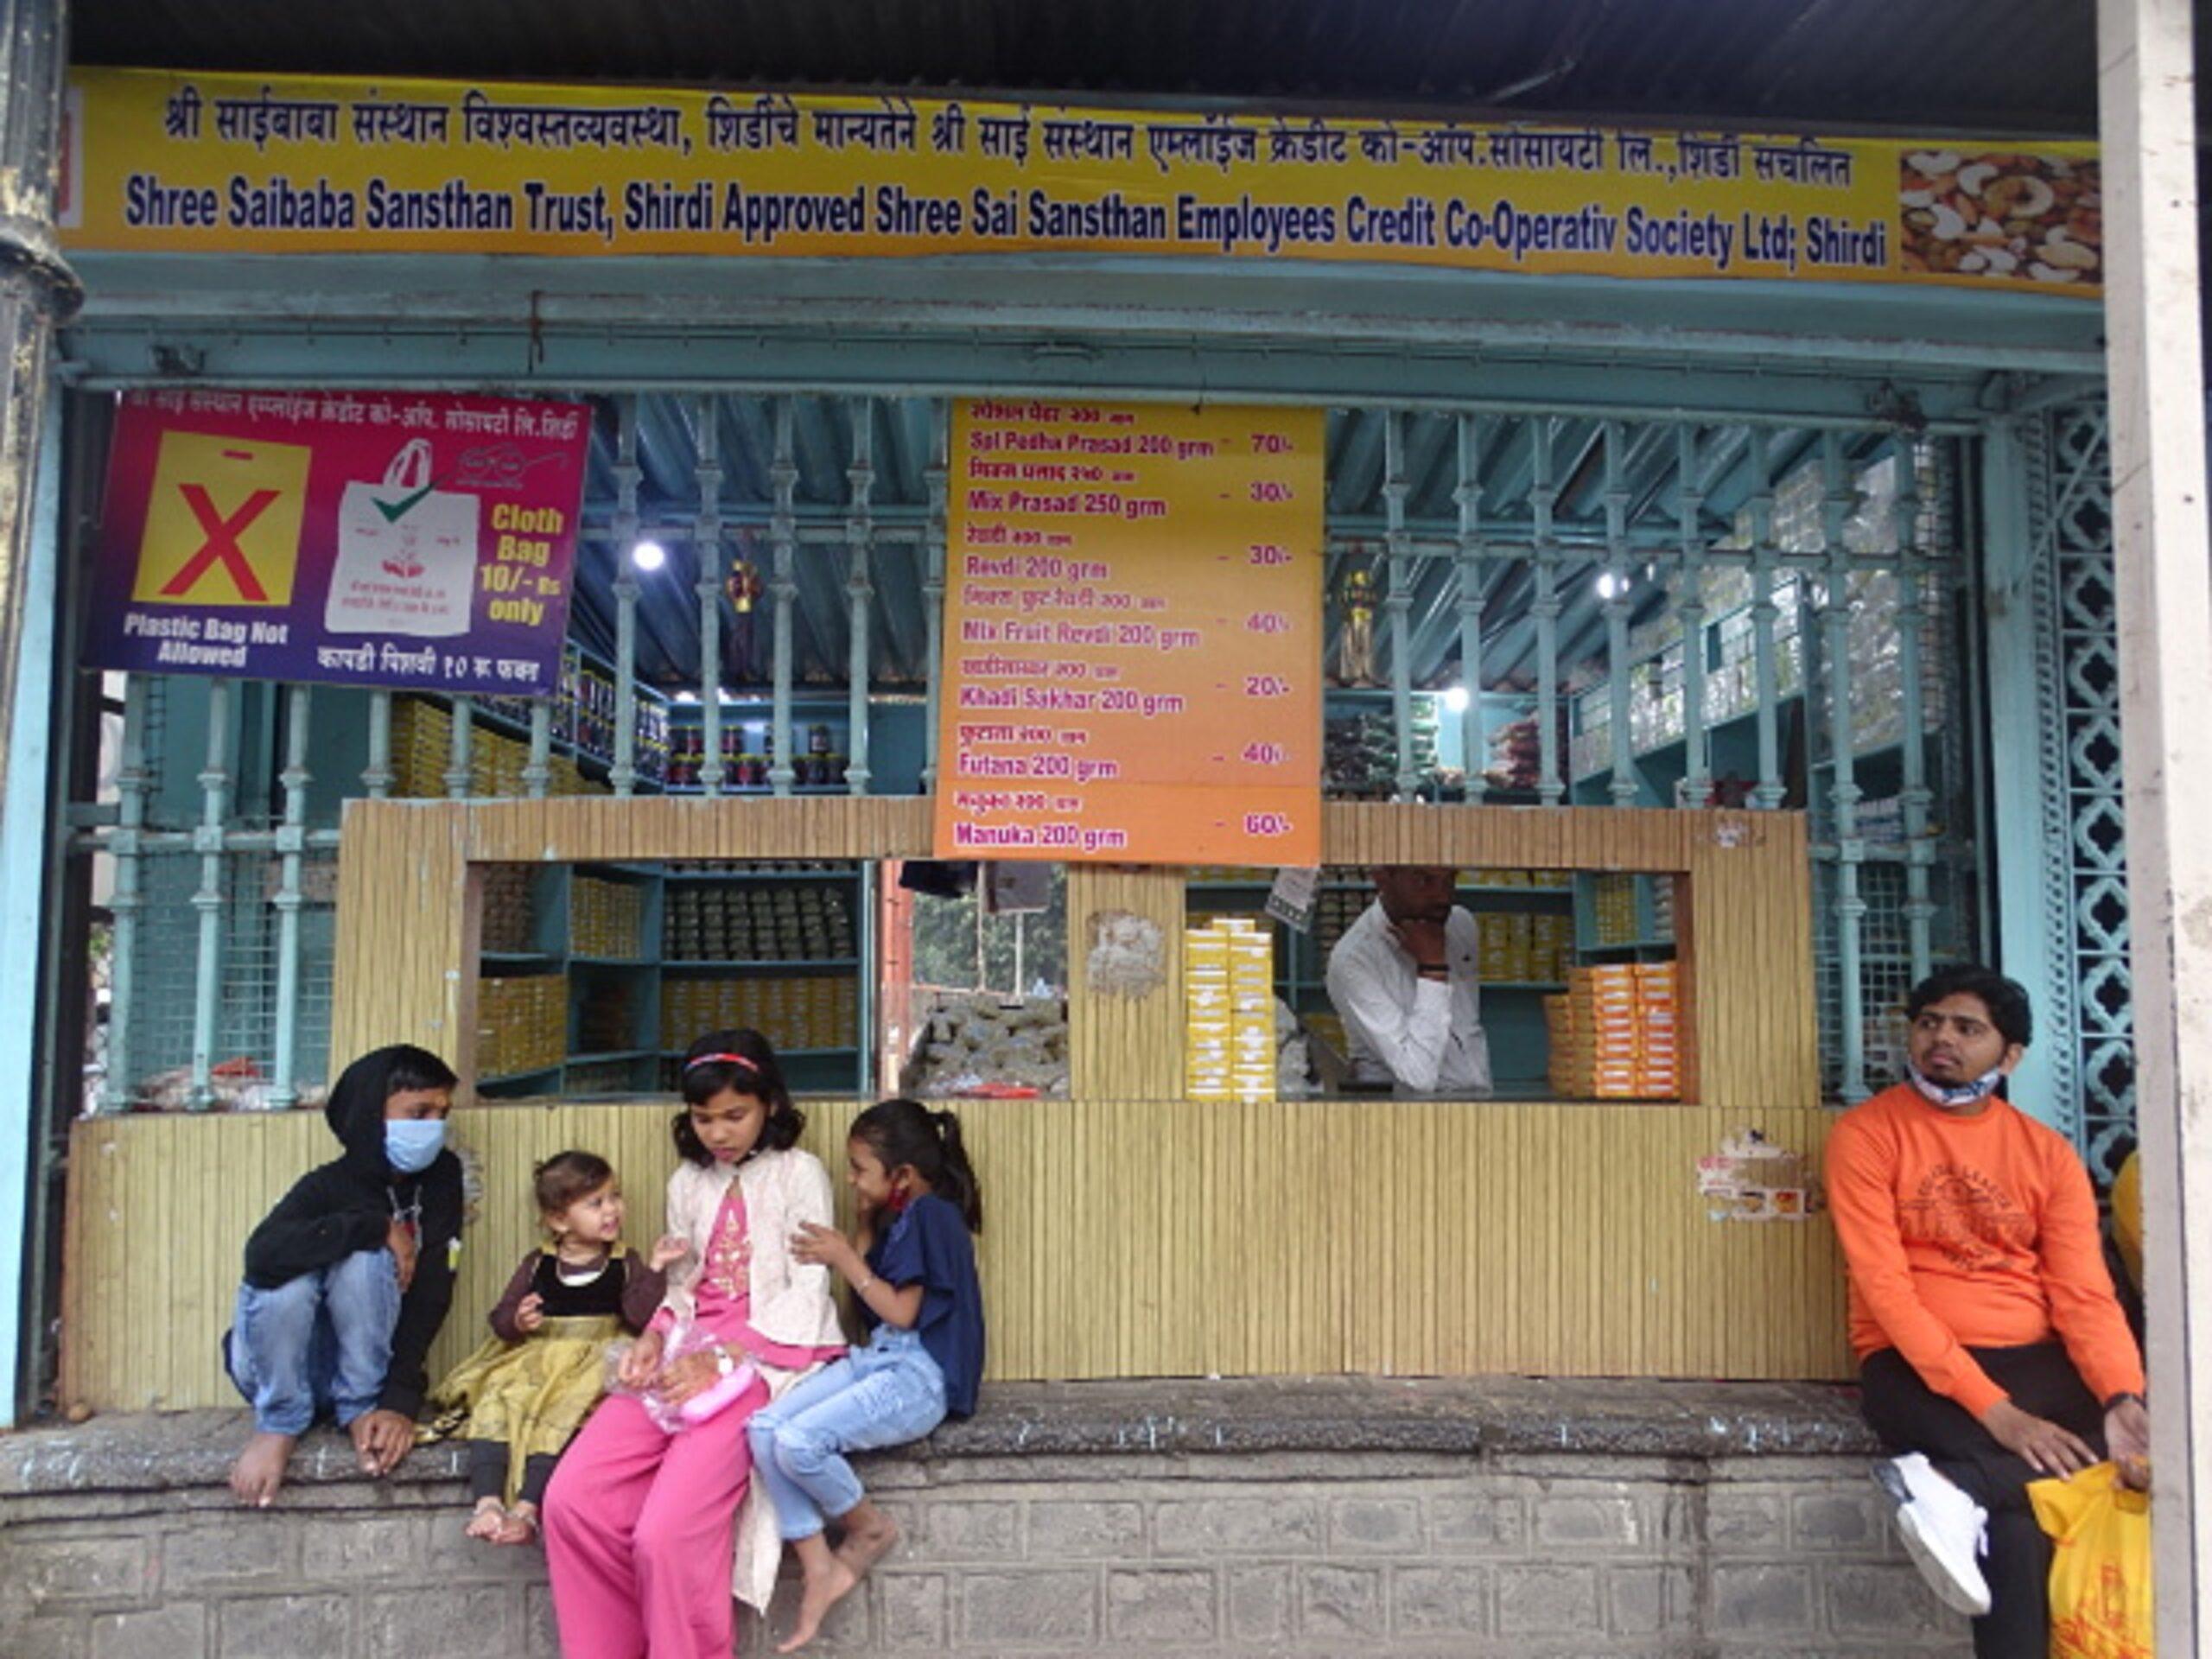 Shree Saibaba Sansthan Trust, Shirdi Approved Shree Sai Sansthan Employees Credit Co-Operative Society Ltd; Shirdi, Maharashtra